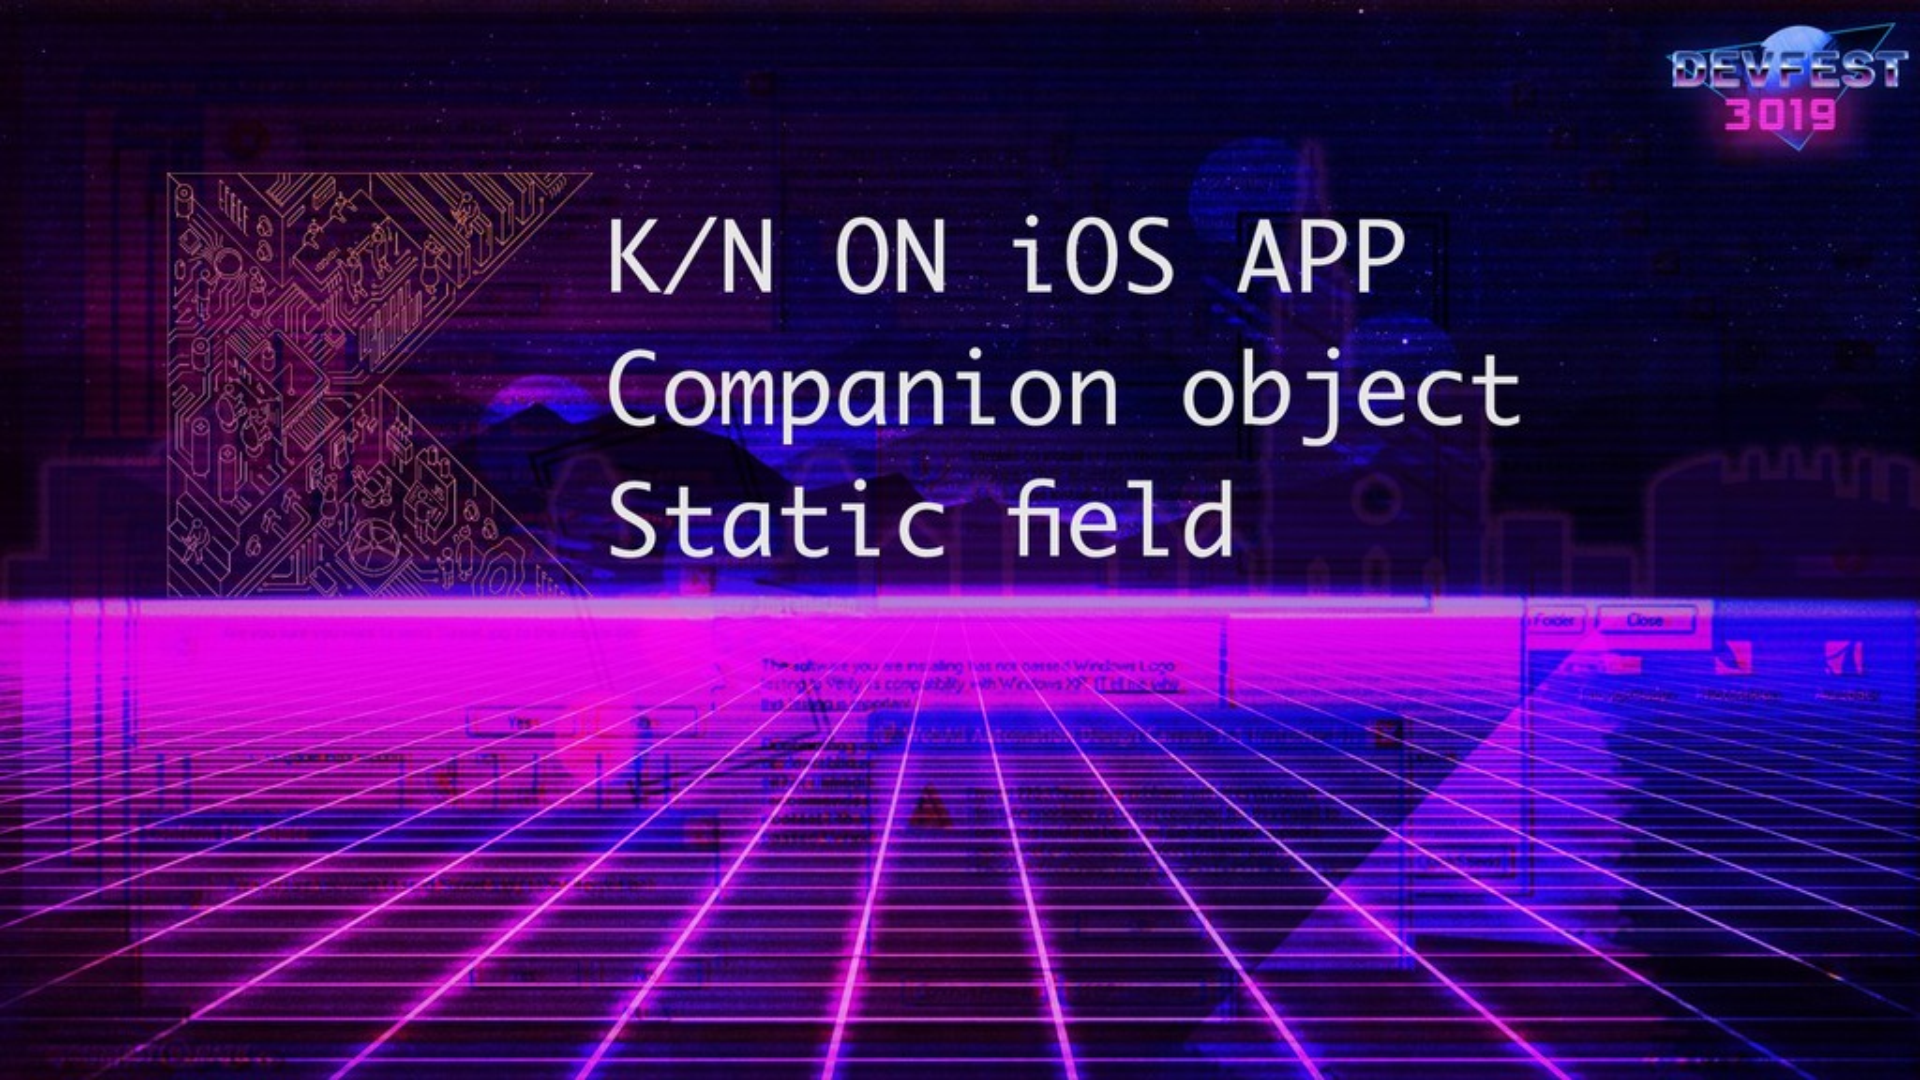 K/N ON iOS APP Companion object Static field